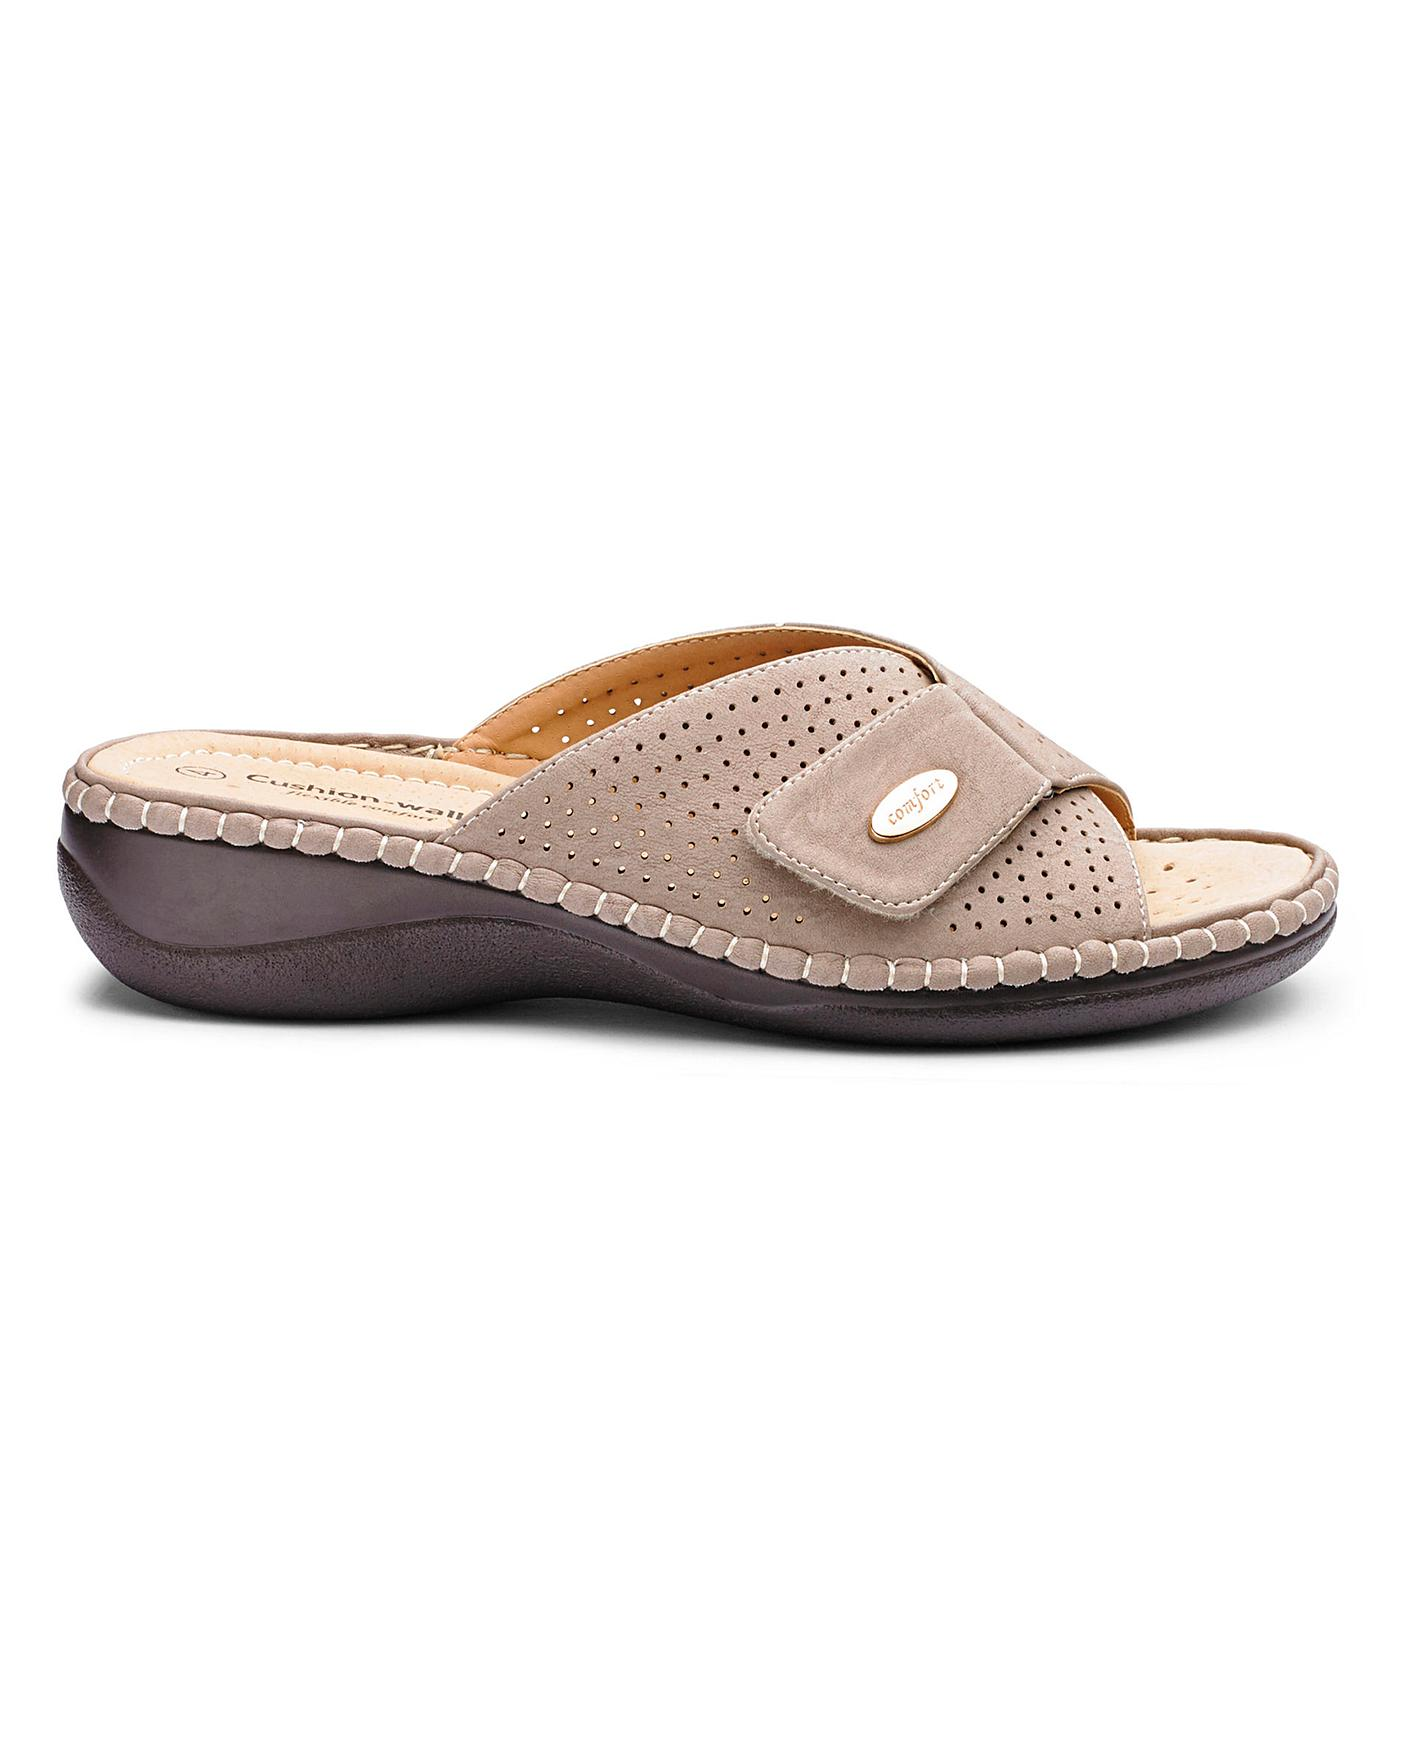 5f4504e457b2 Cushion Walk Mule Sandals EEE Fit